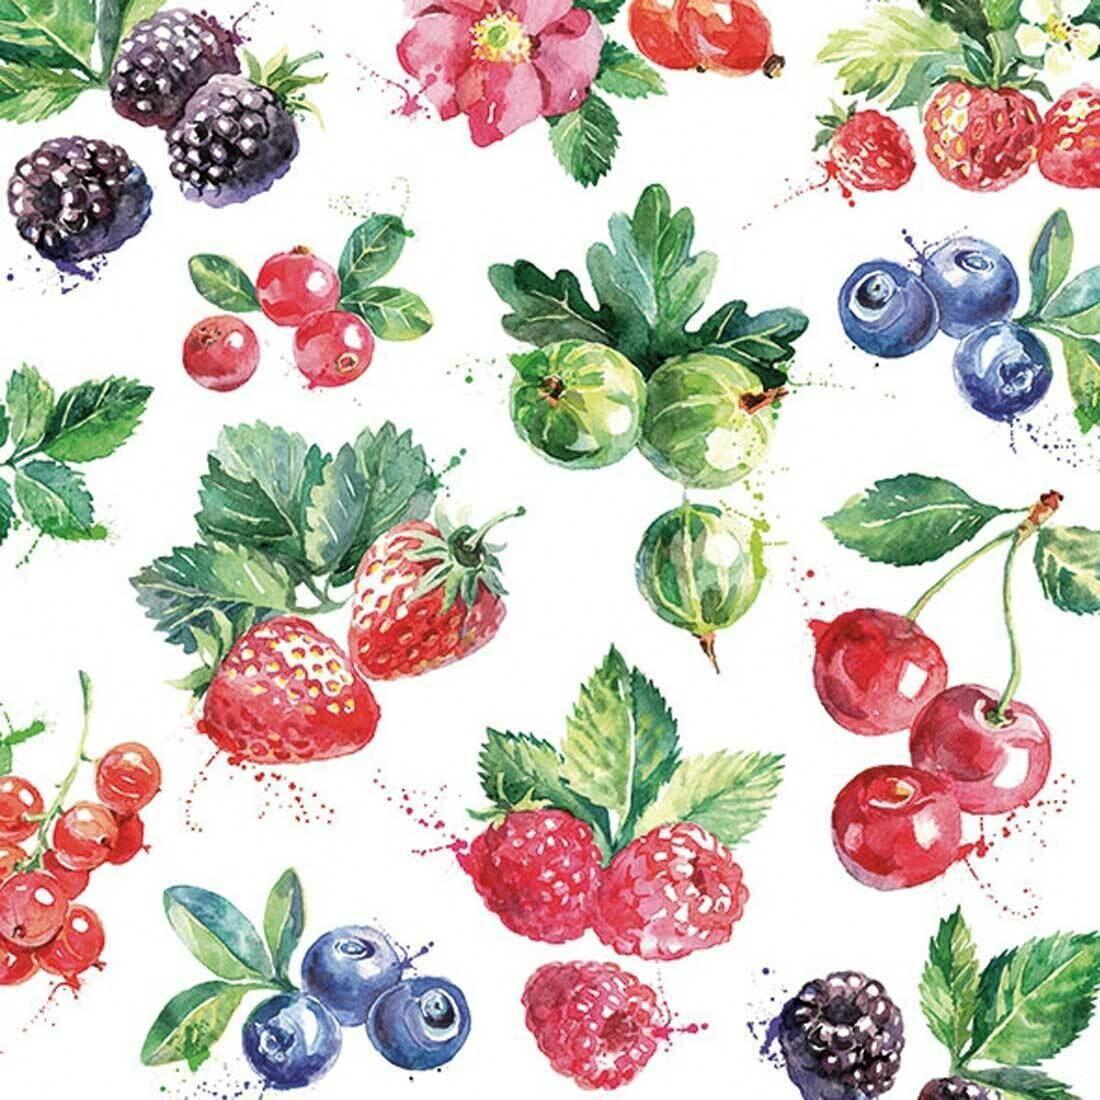 Decoupage Paper Napkins - Mixed Fruit 13x13 (1 Sheet)